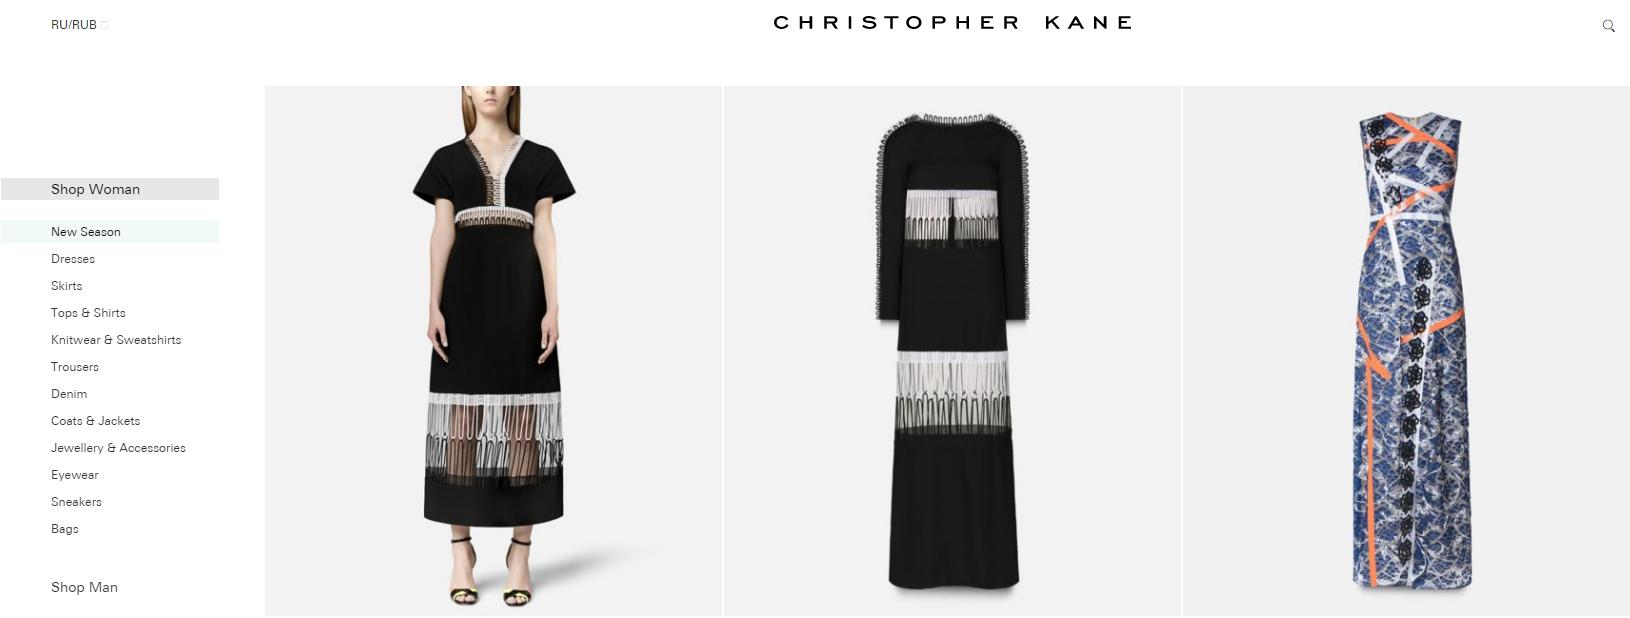 Кристофер Кейн запустил онлайн-магазин